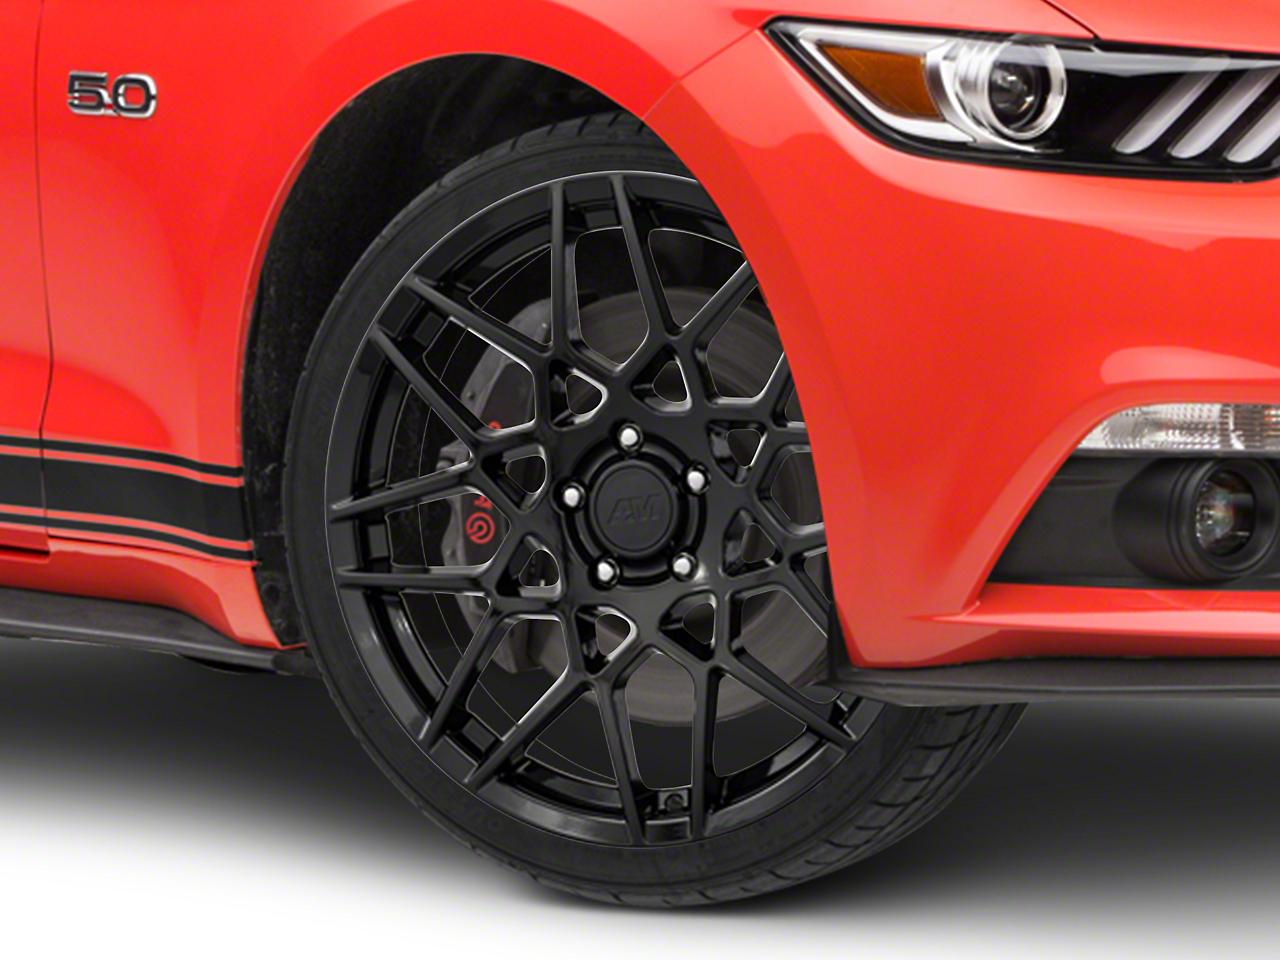 2013 GT500 Style Gloss Black Wheel - 19x8.5 (15-17 V6, EcoBoost)